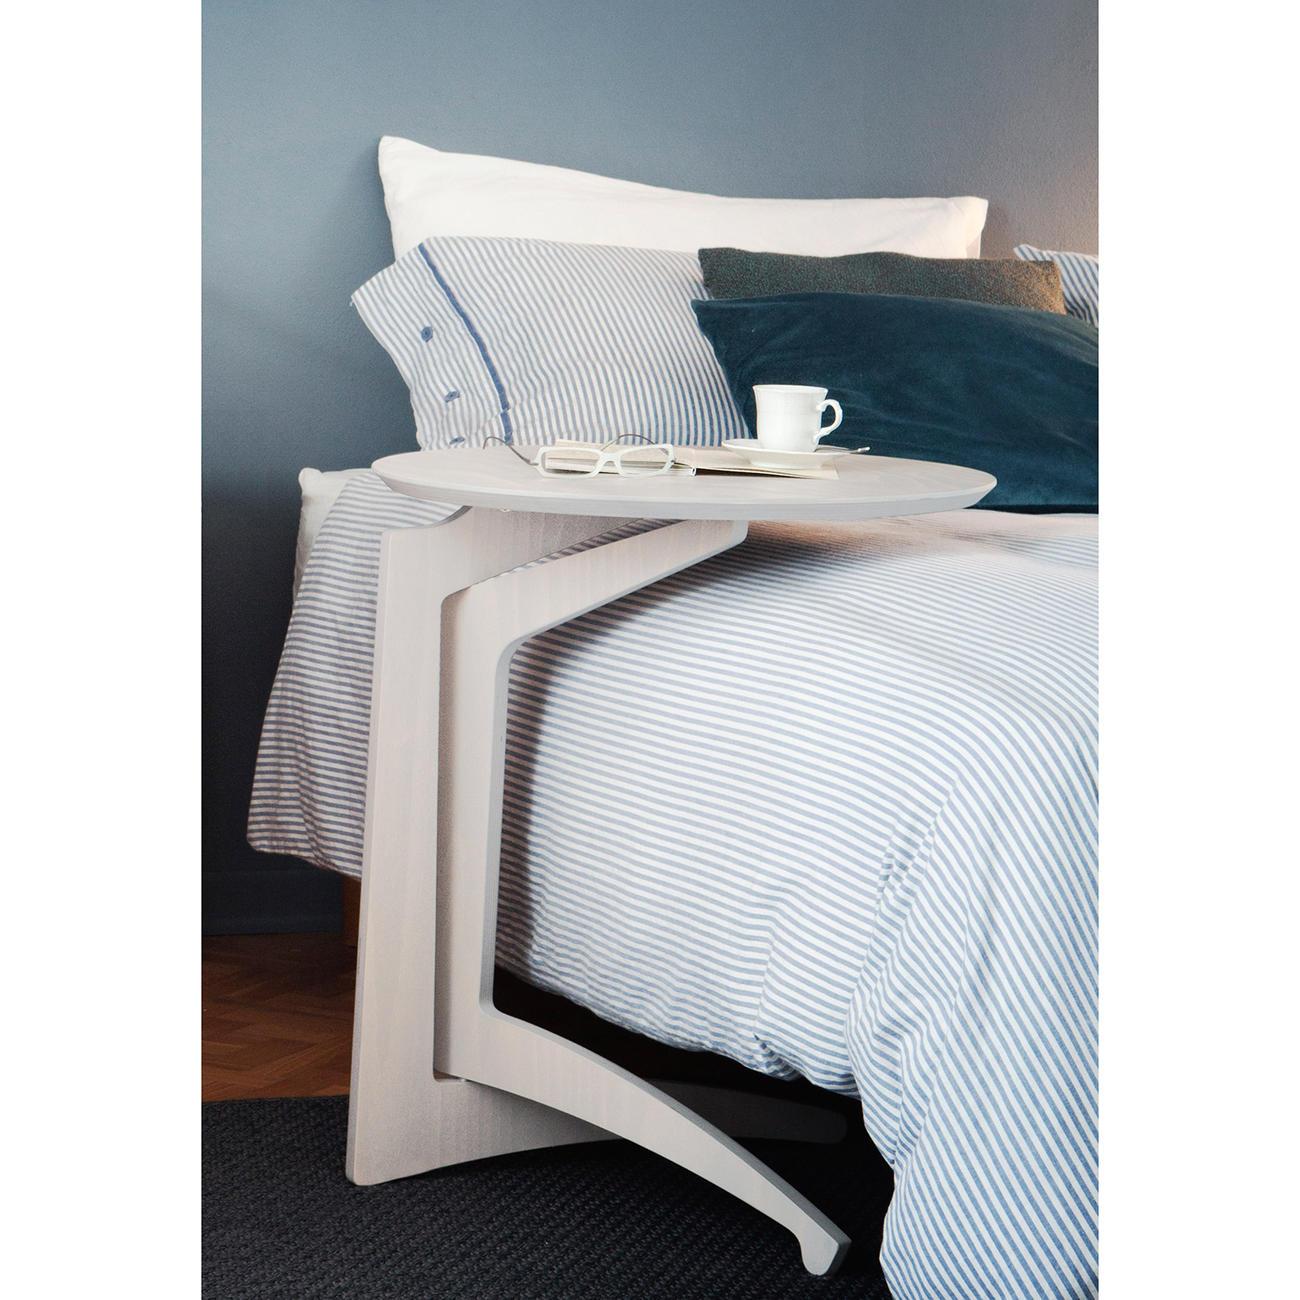 foldme folding table 63 cm h wei online kaufen. Black Bedroom Furniture Sets. Home Design Ideas